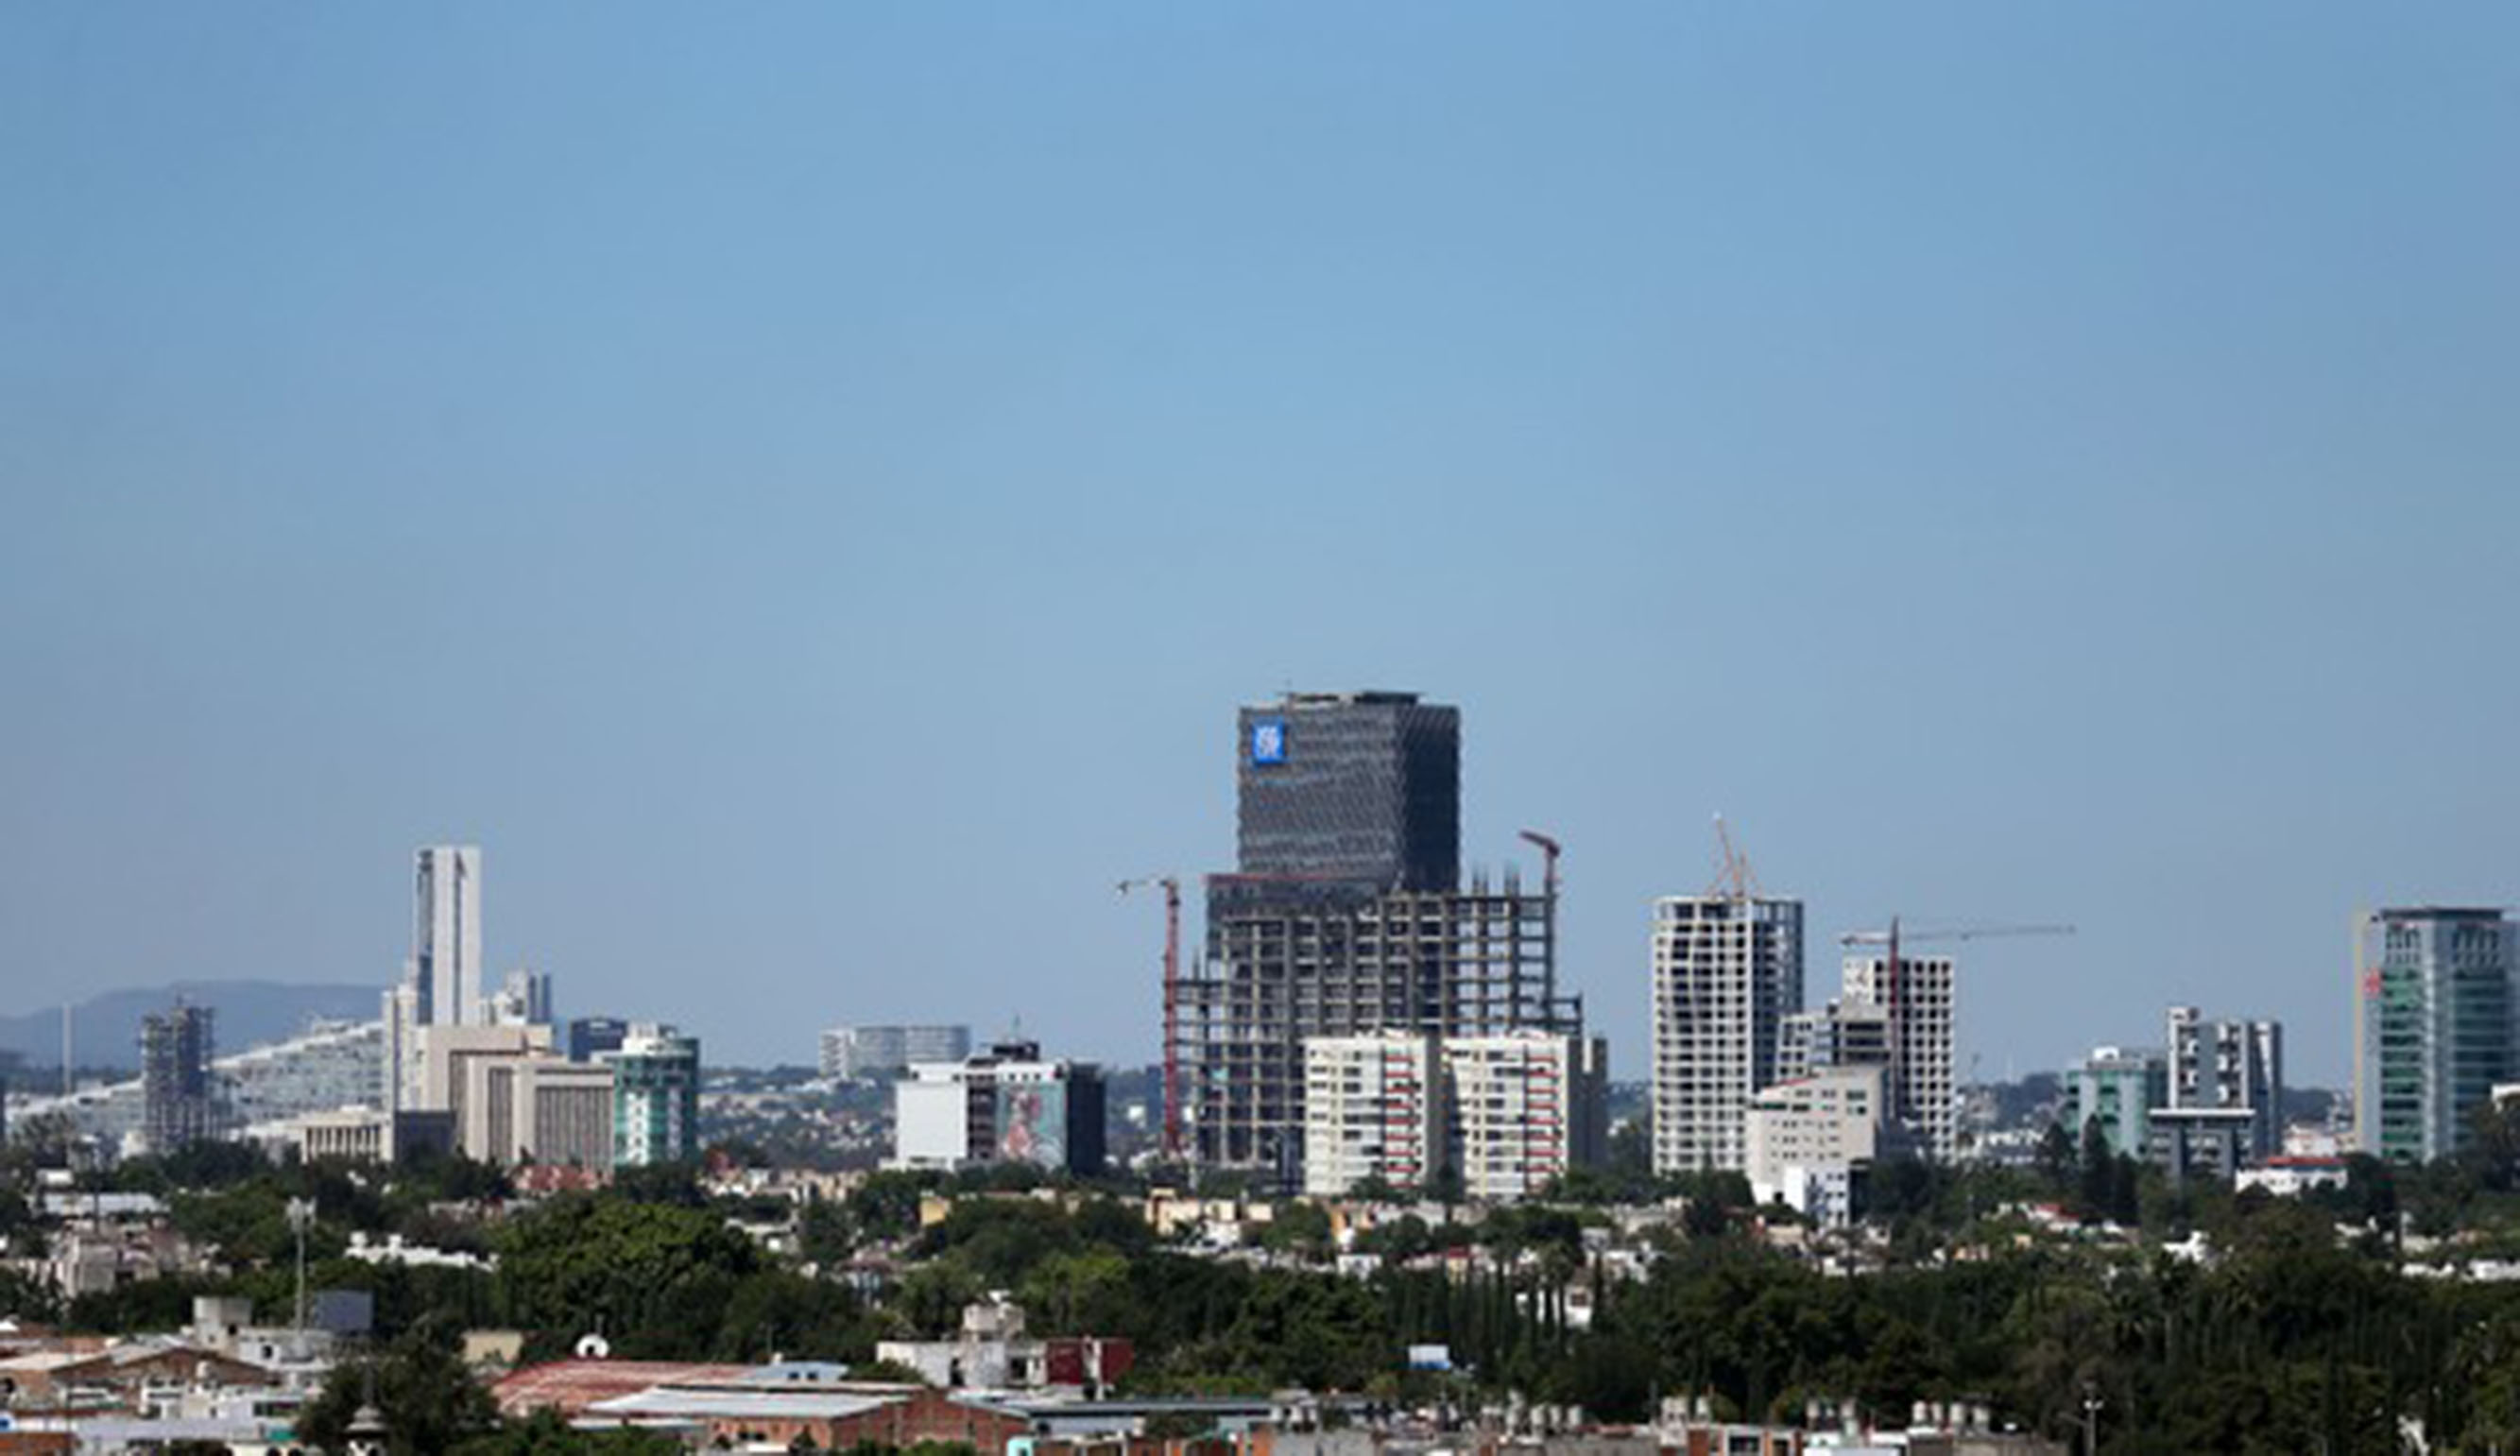 Edificios de la zona metropolitana